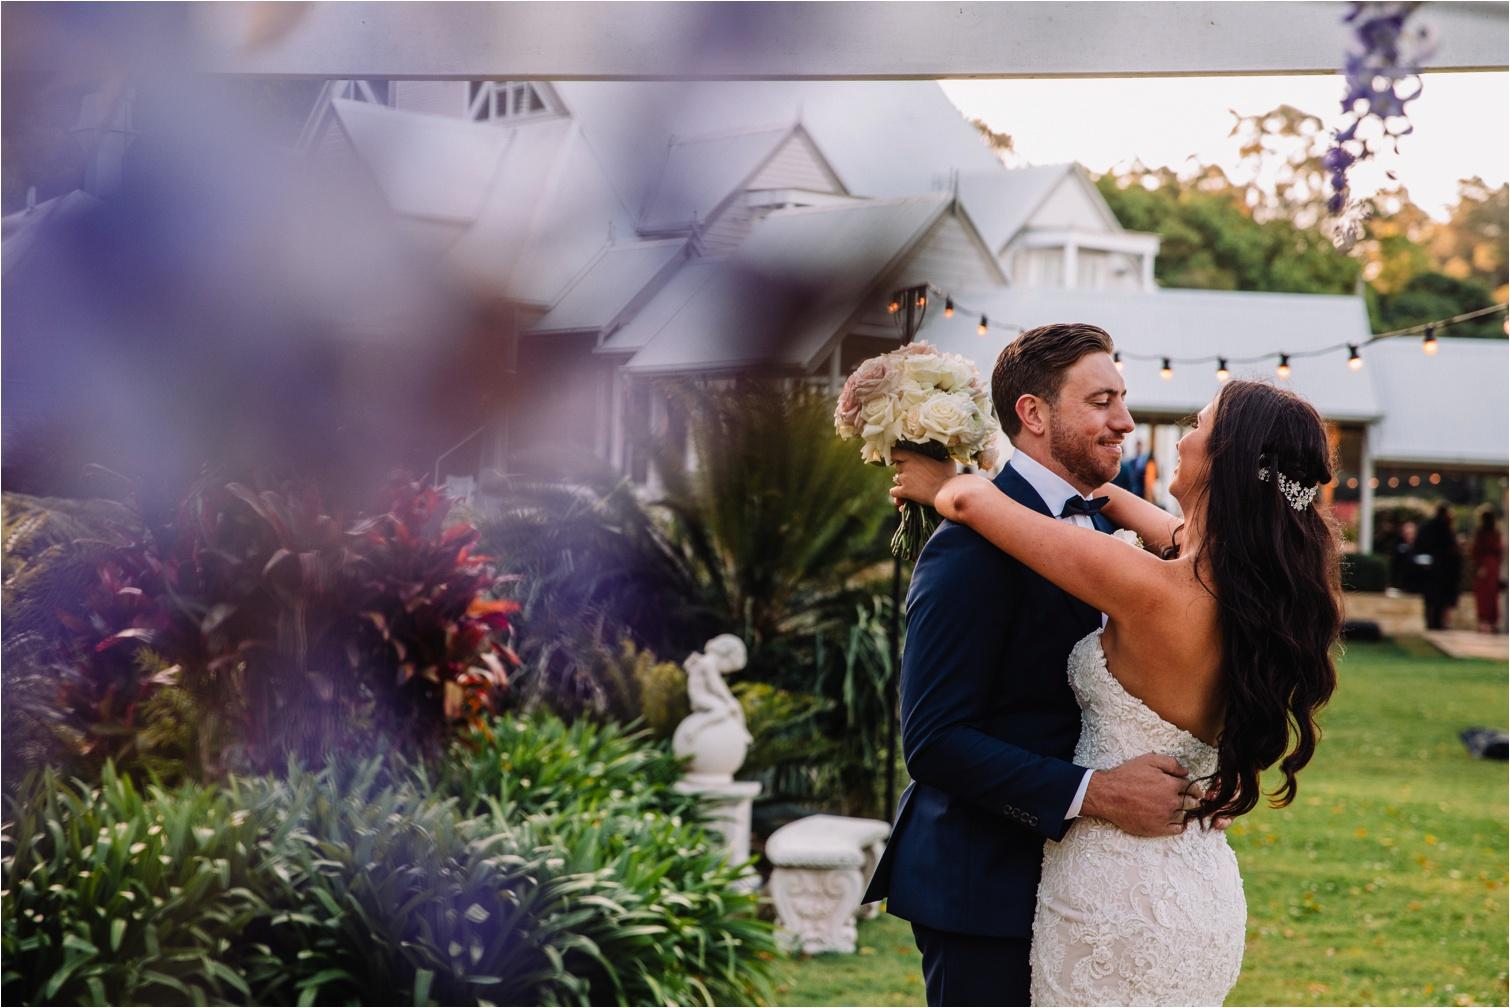 Maleny Manor Wedding Photography - Gold Coast Wedding Photographer_0044.jpg